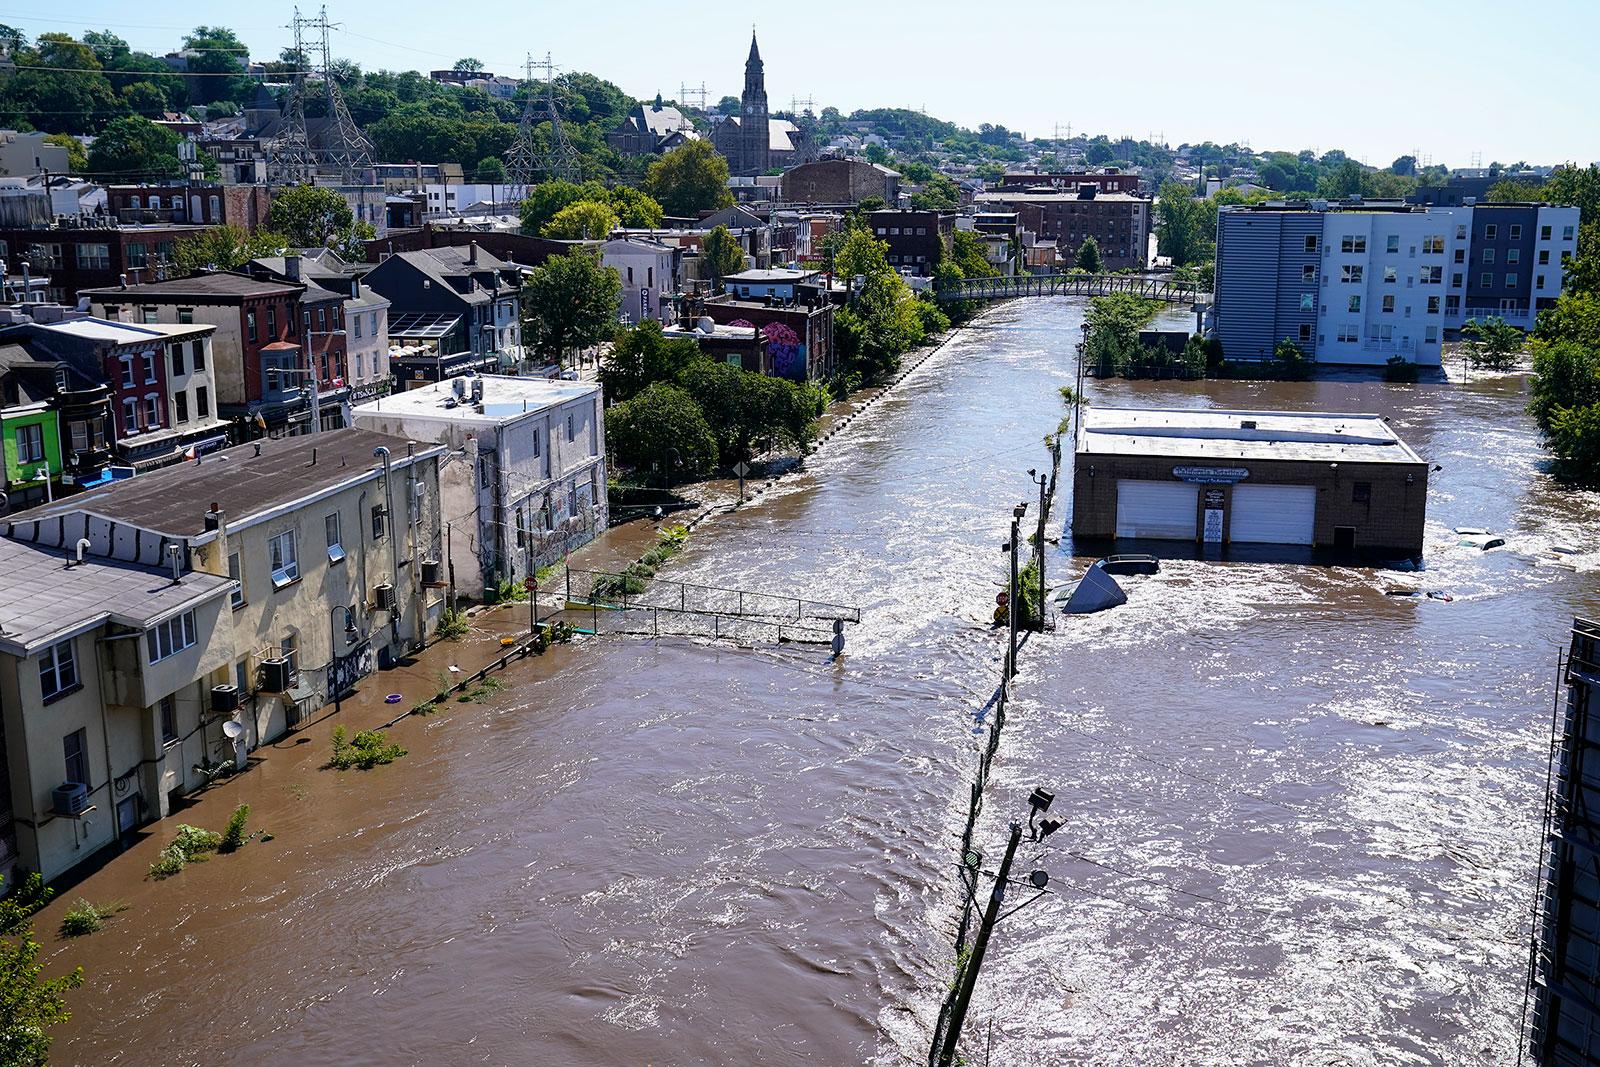 Water spills over the banks of the Schuylkill River in Philadelphia on Thursday.